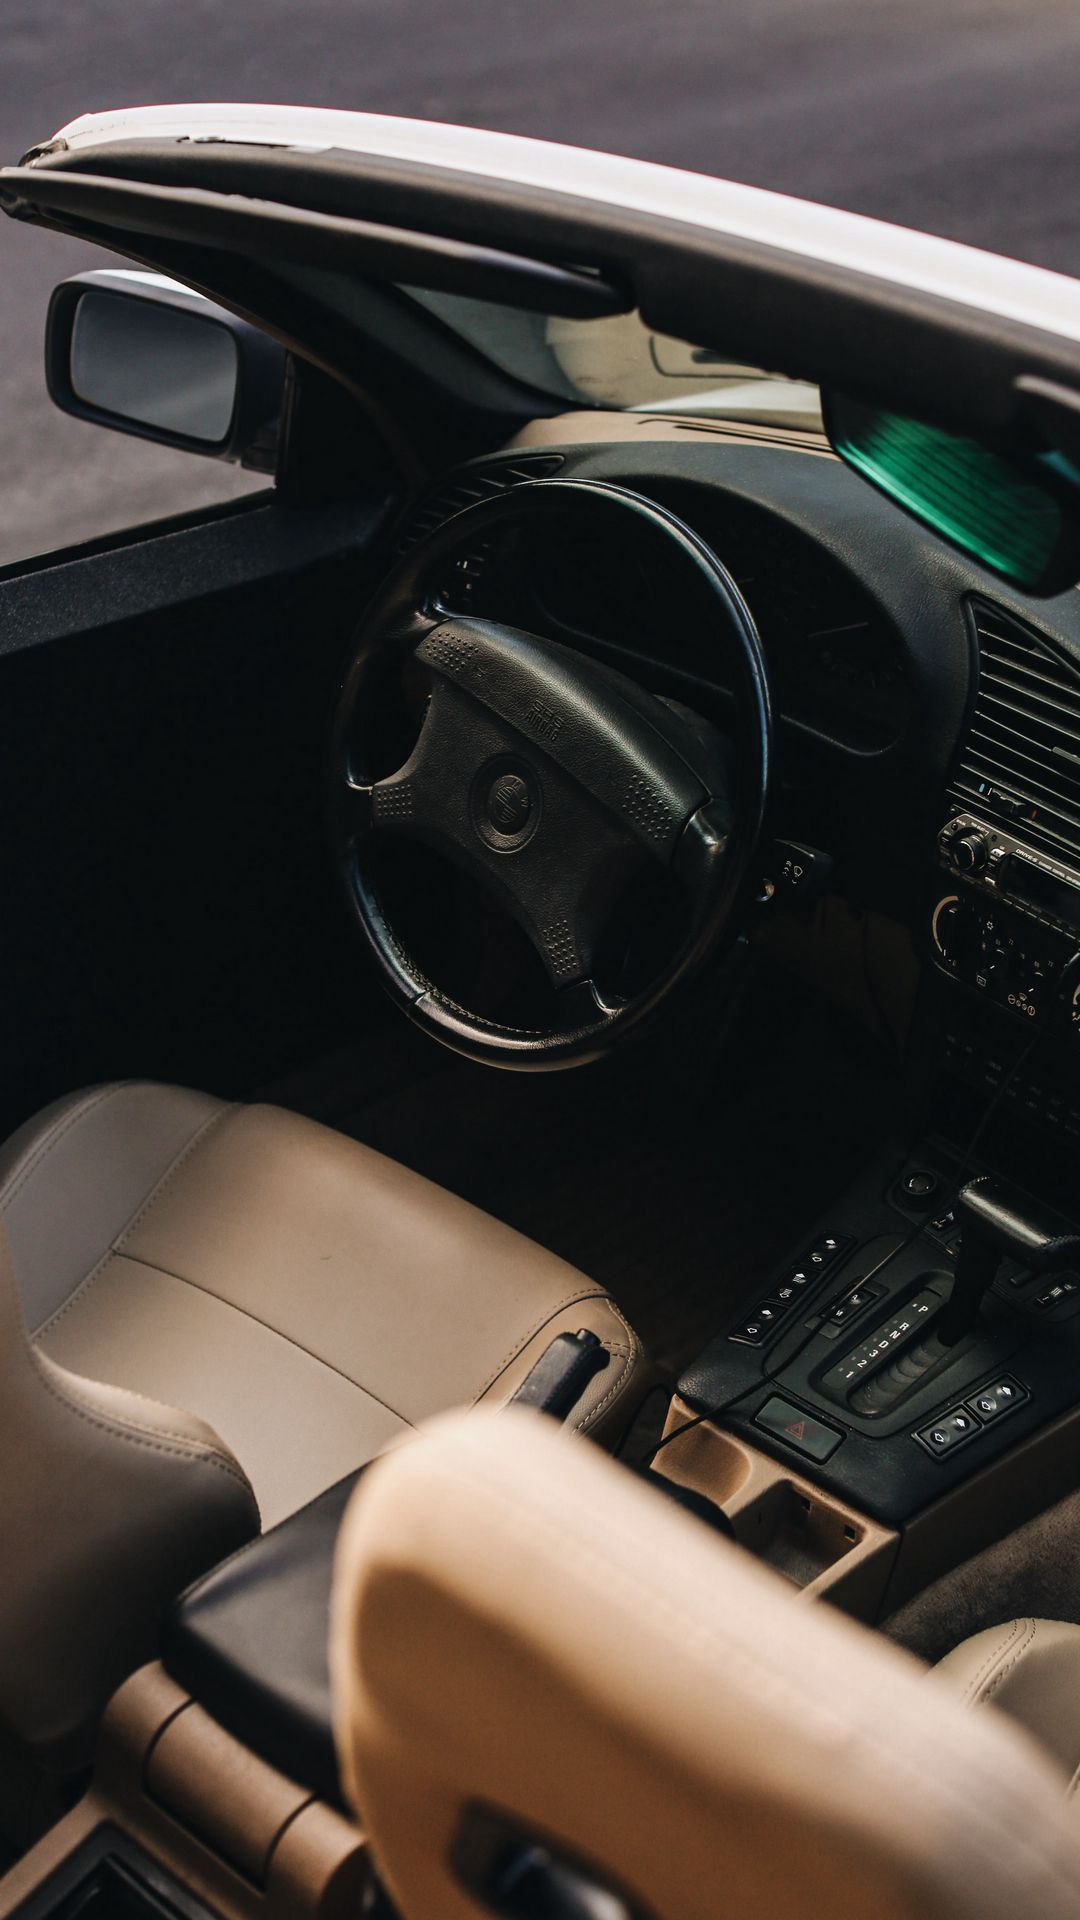 Bmw Salon Steering Series Wallpapers Free Download